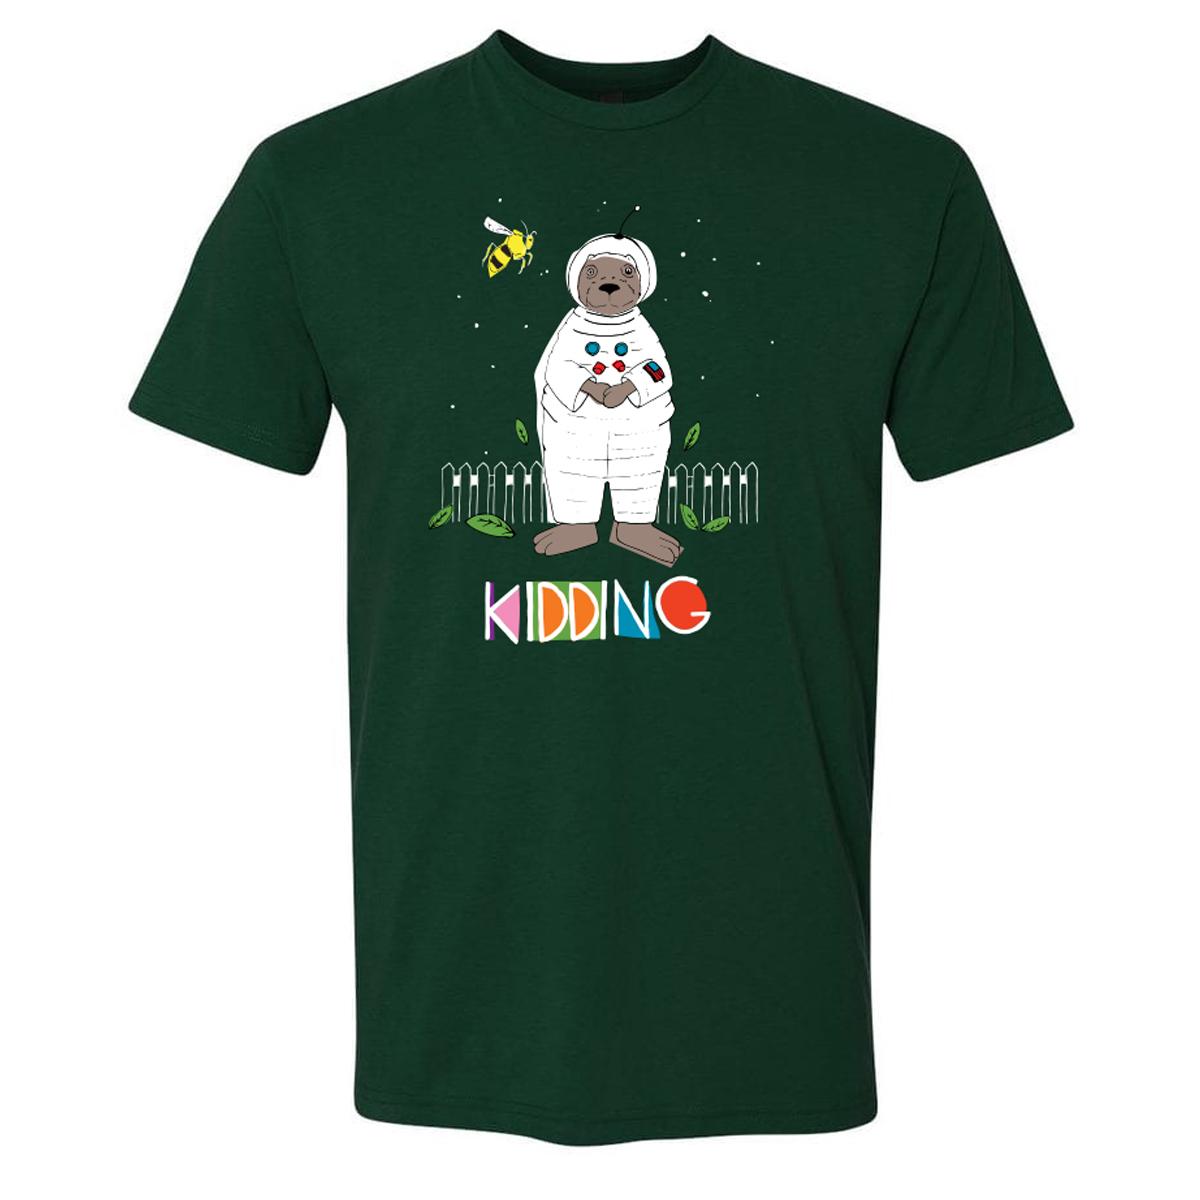 Kidding Astronotter T-Shirt (Forest Green)